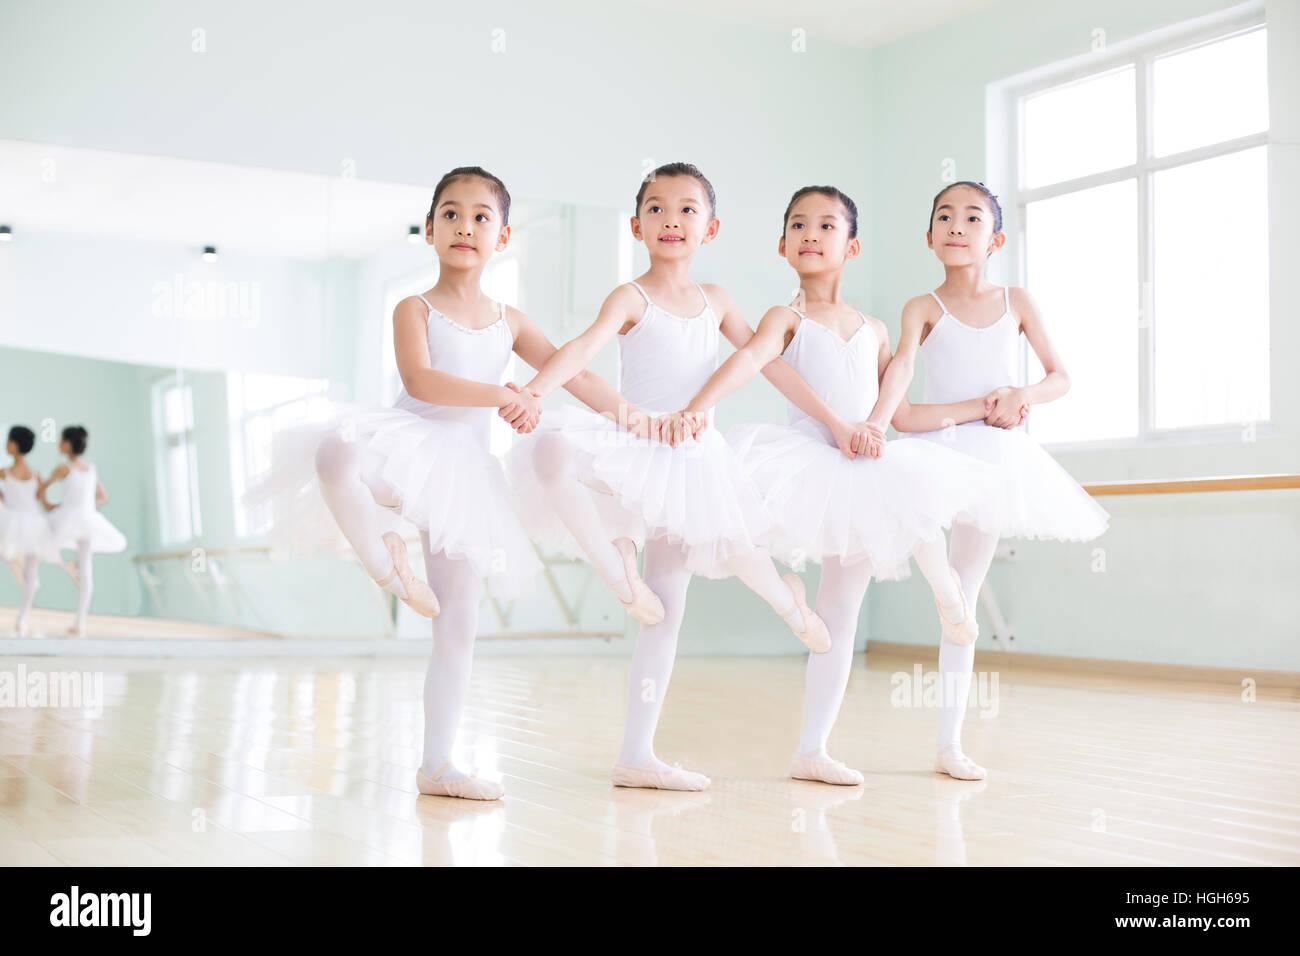 538dd69edf7d Little girls practicing ballet Stock Photo  130685217 - Alamy